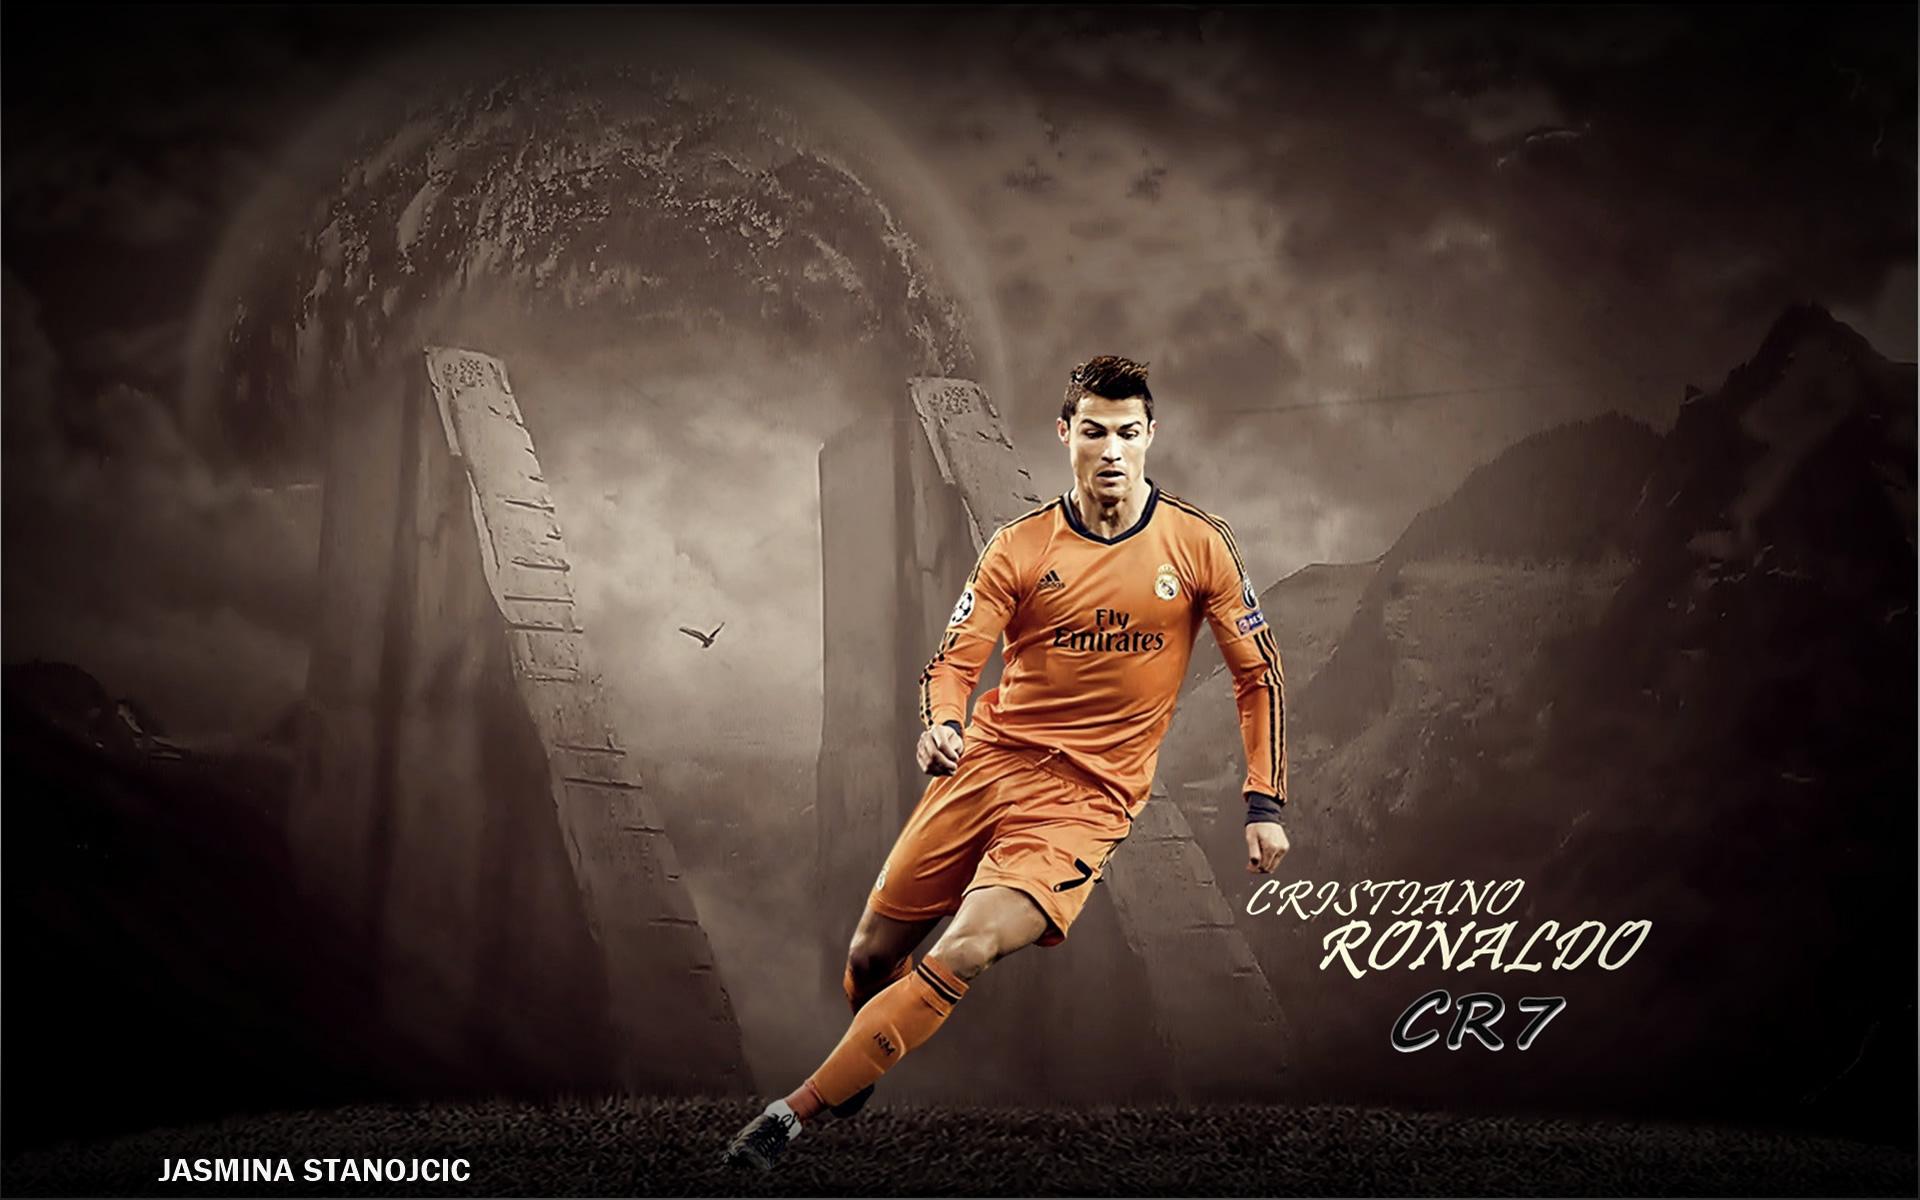 Free Download Cristiano Ronaldo 2014 Real Madrid Wallpaper